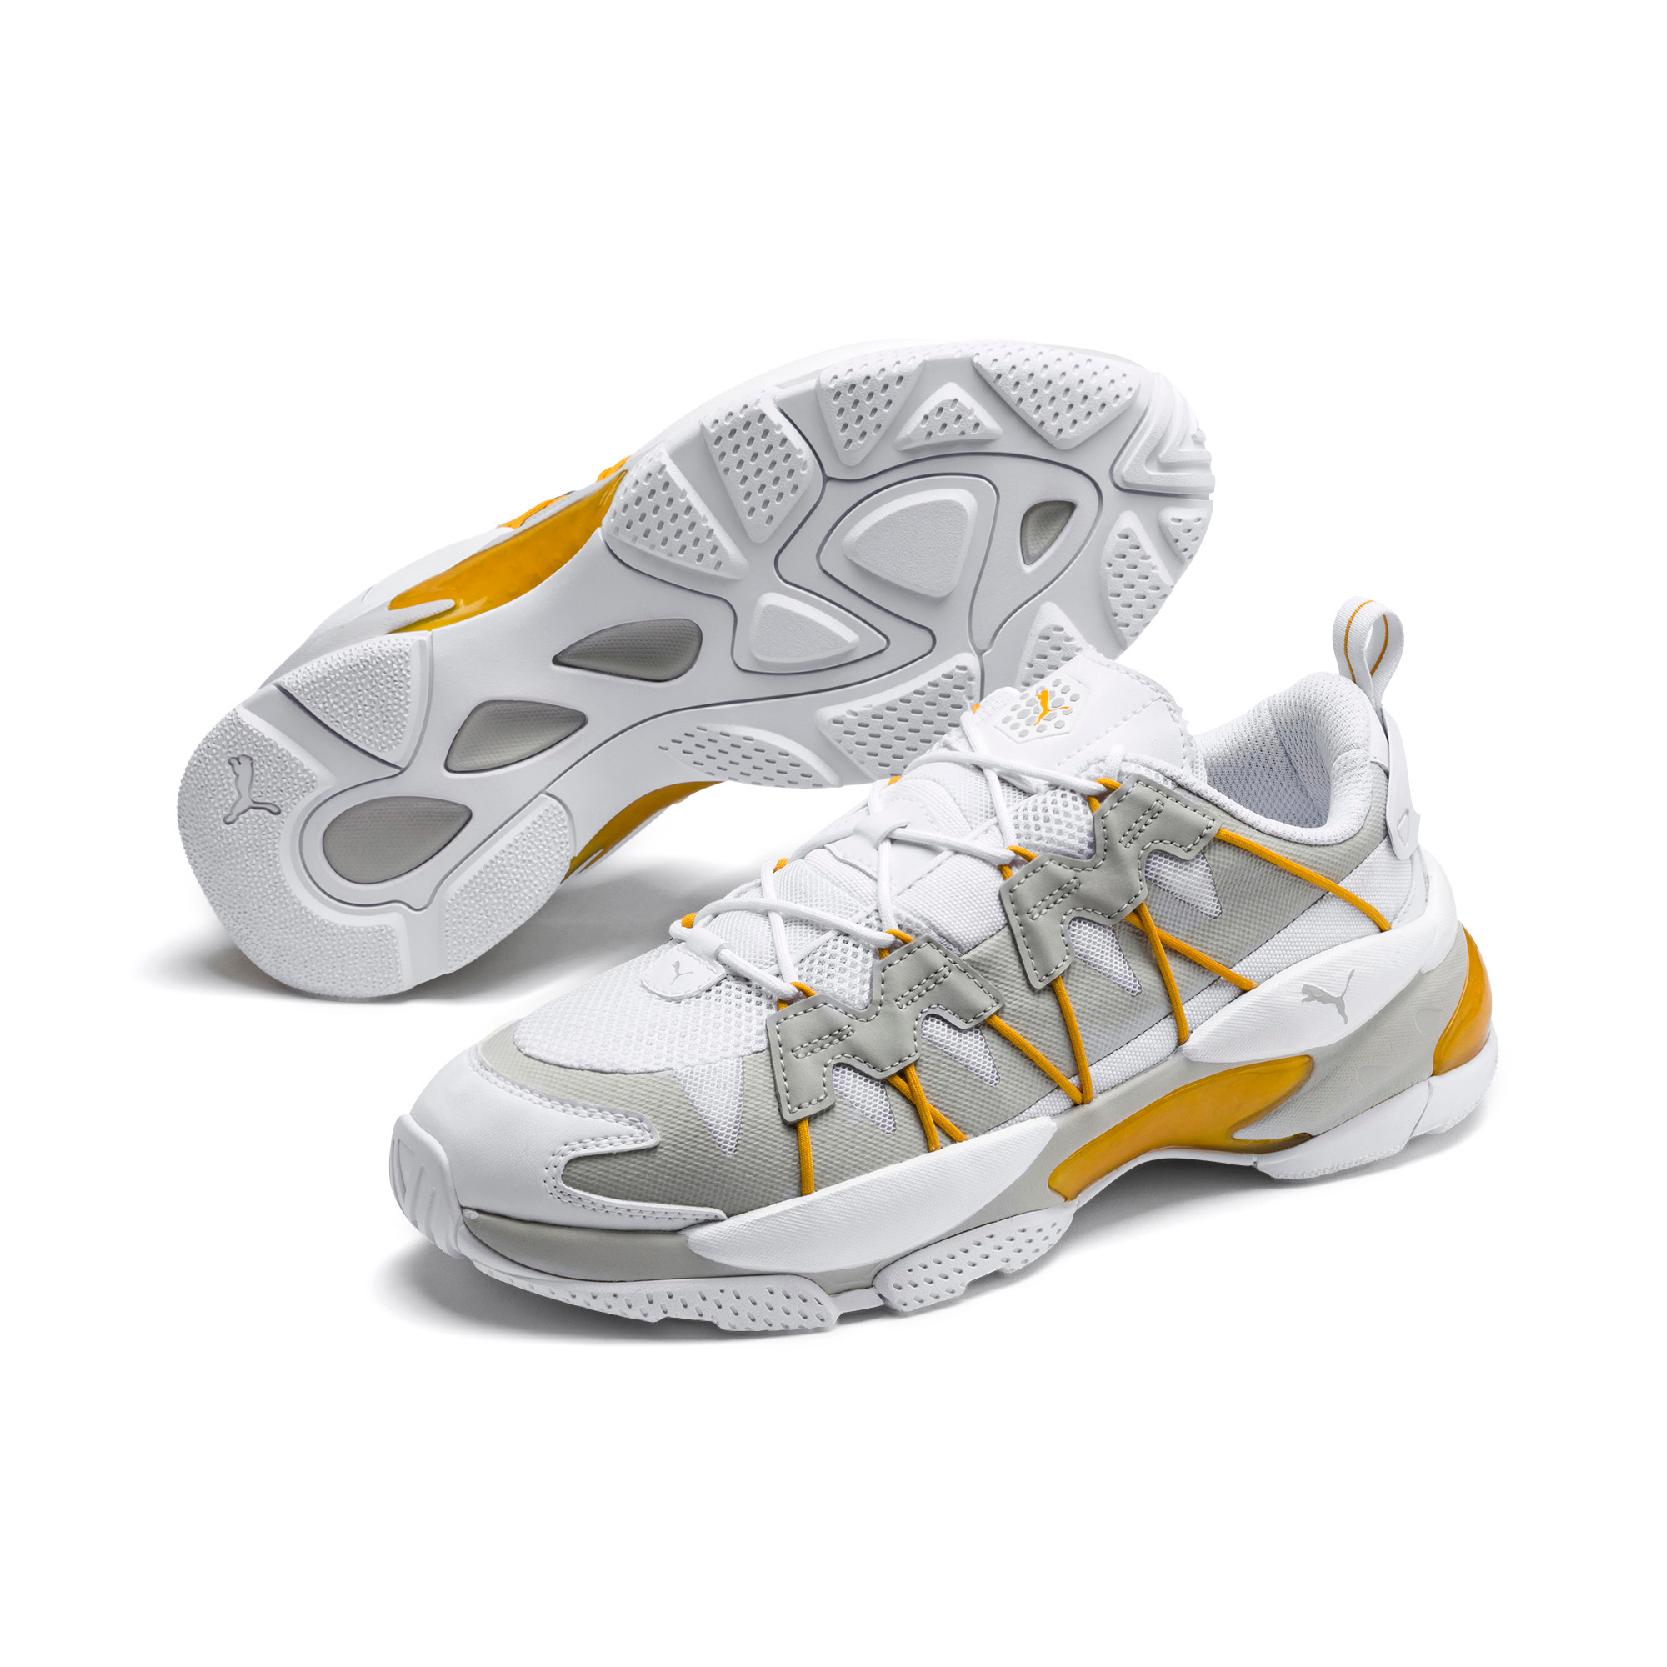 Puma LQD Cell Omega Stripe sneakers